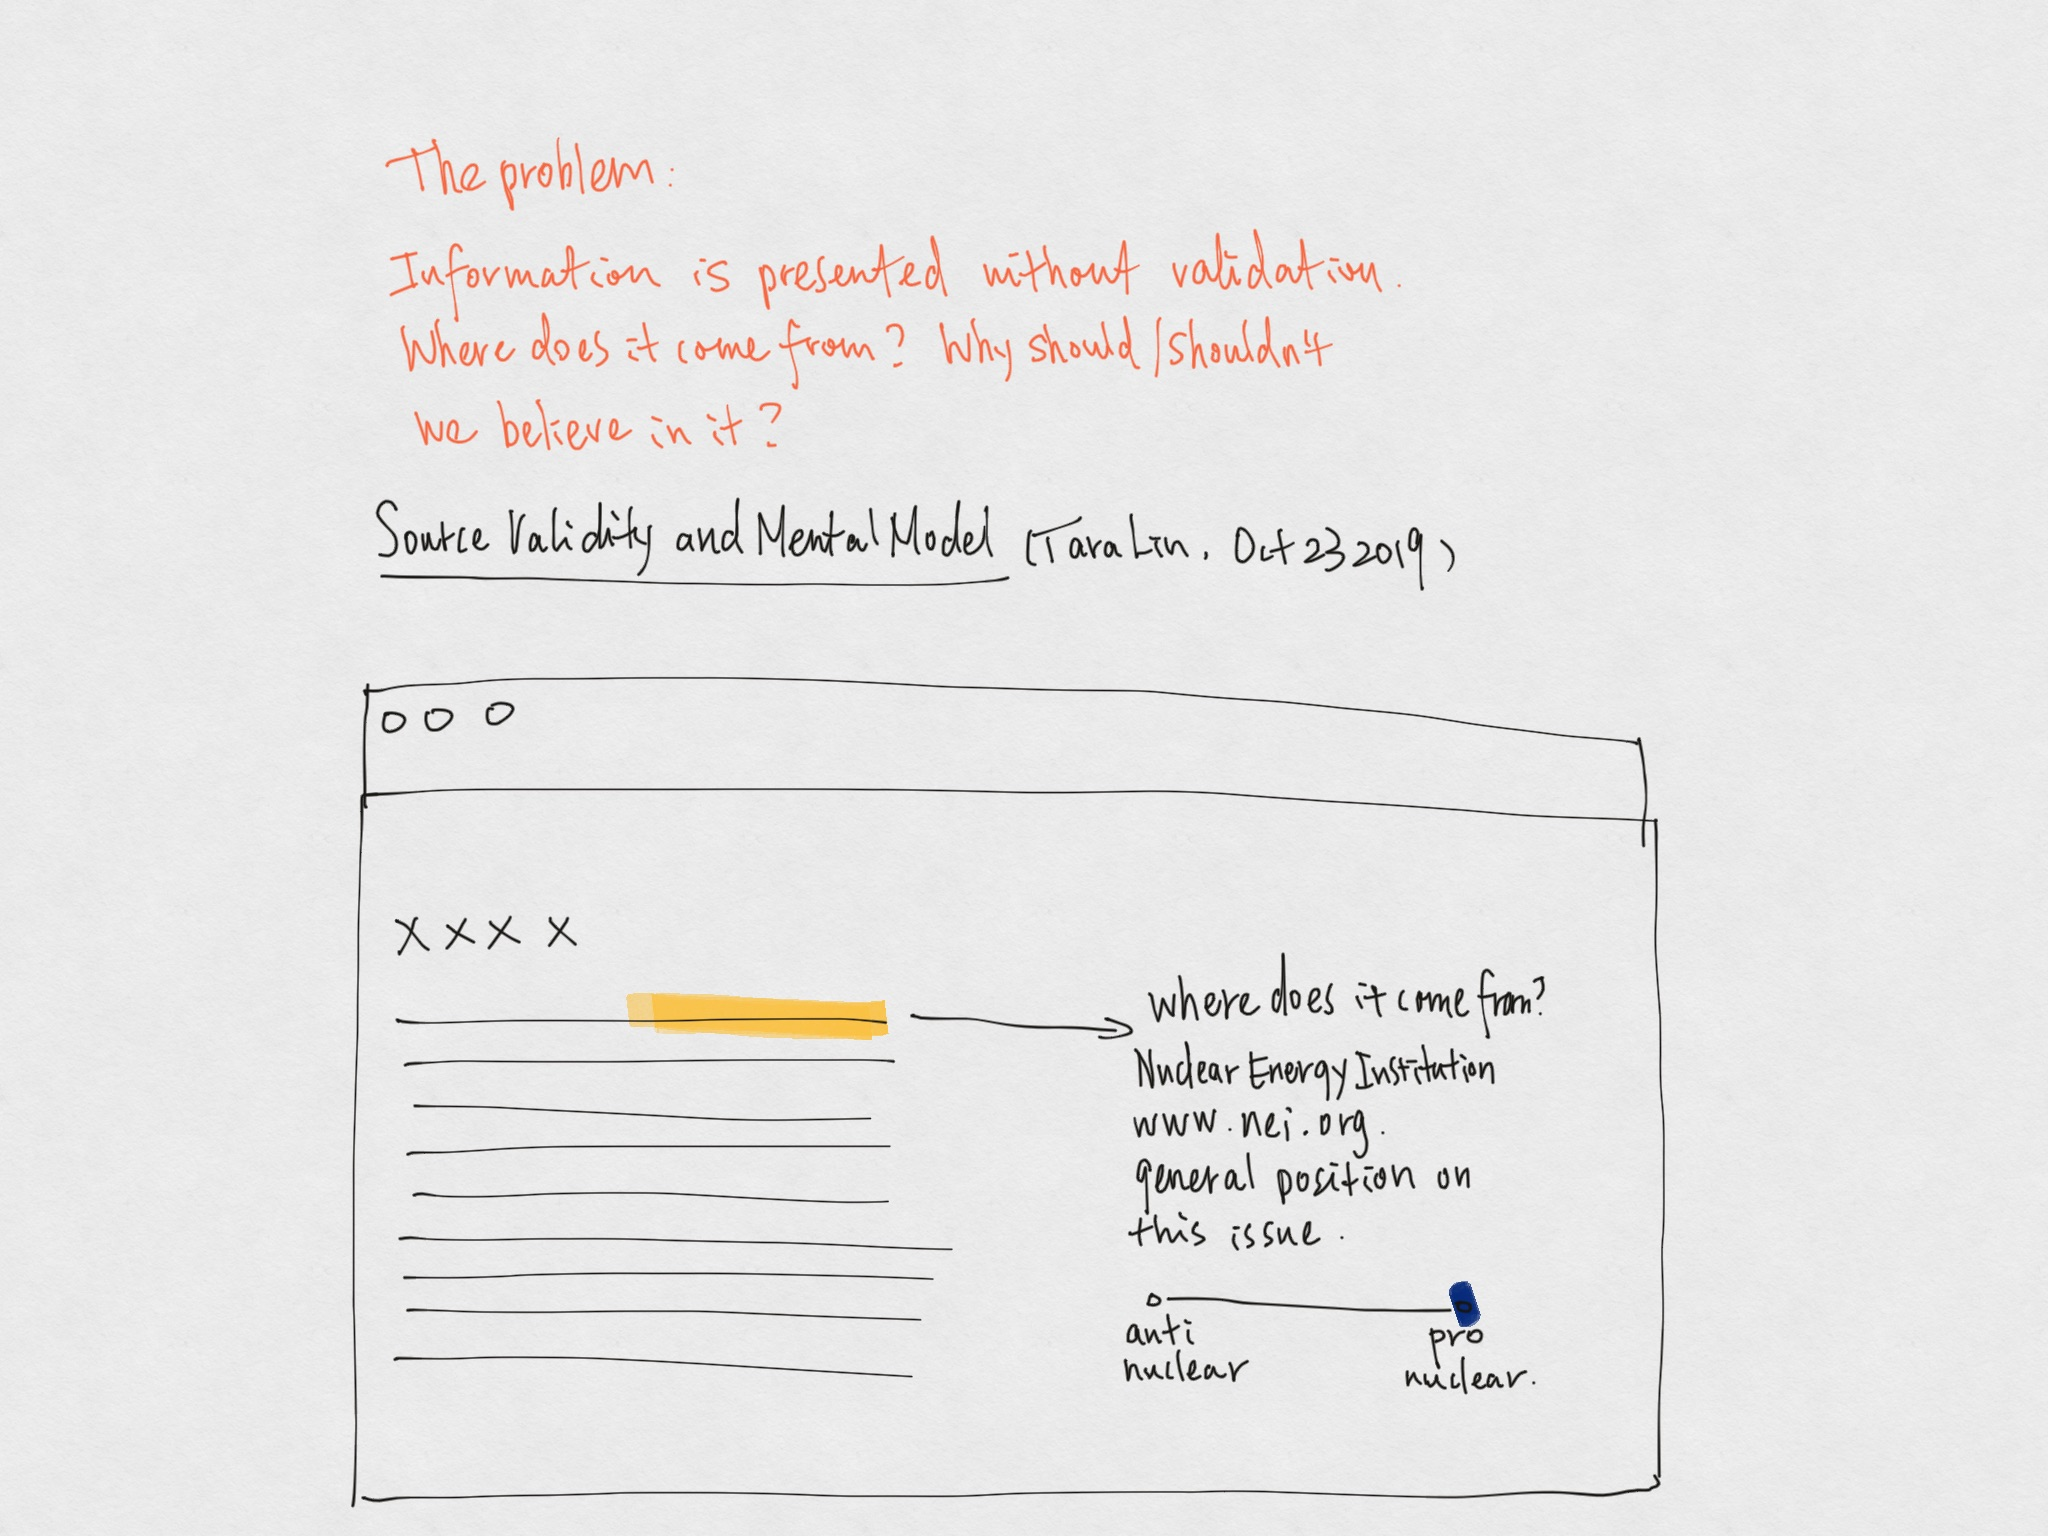 Source Evaluation @Tara Lin